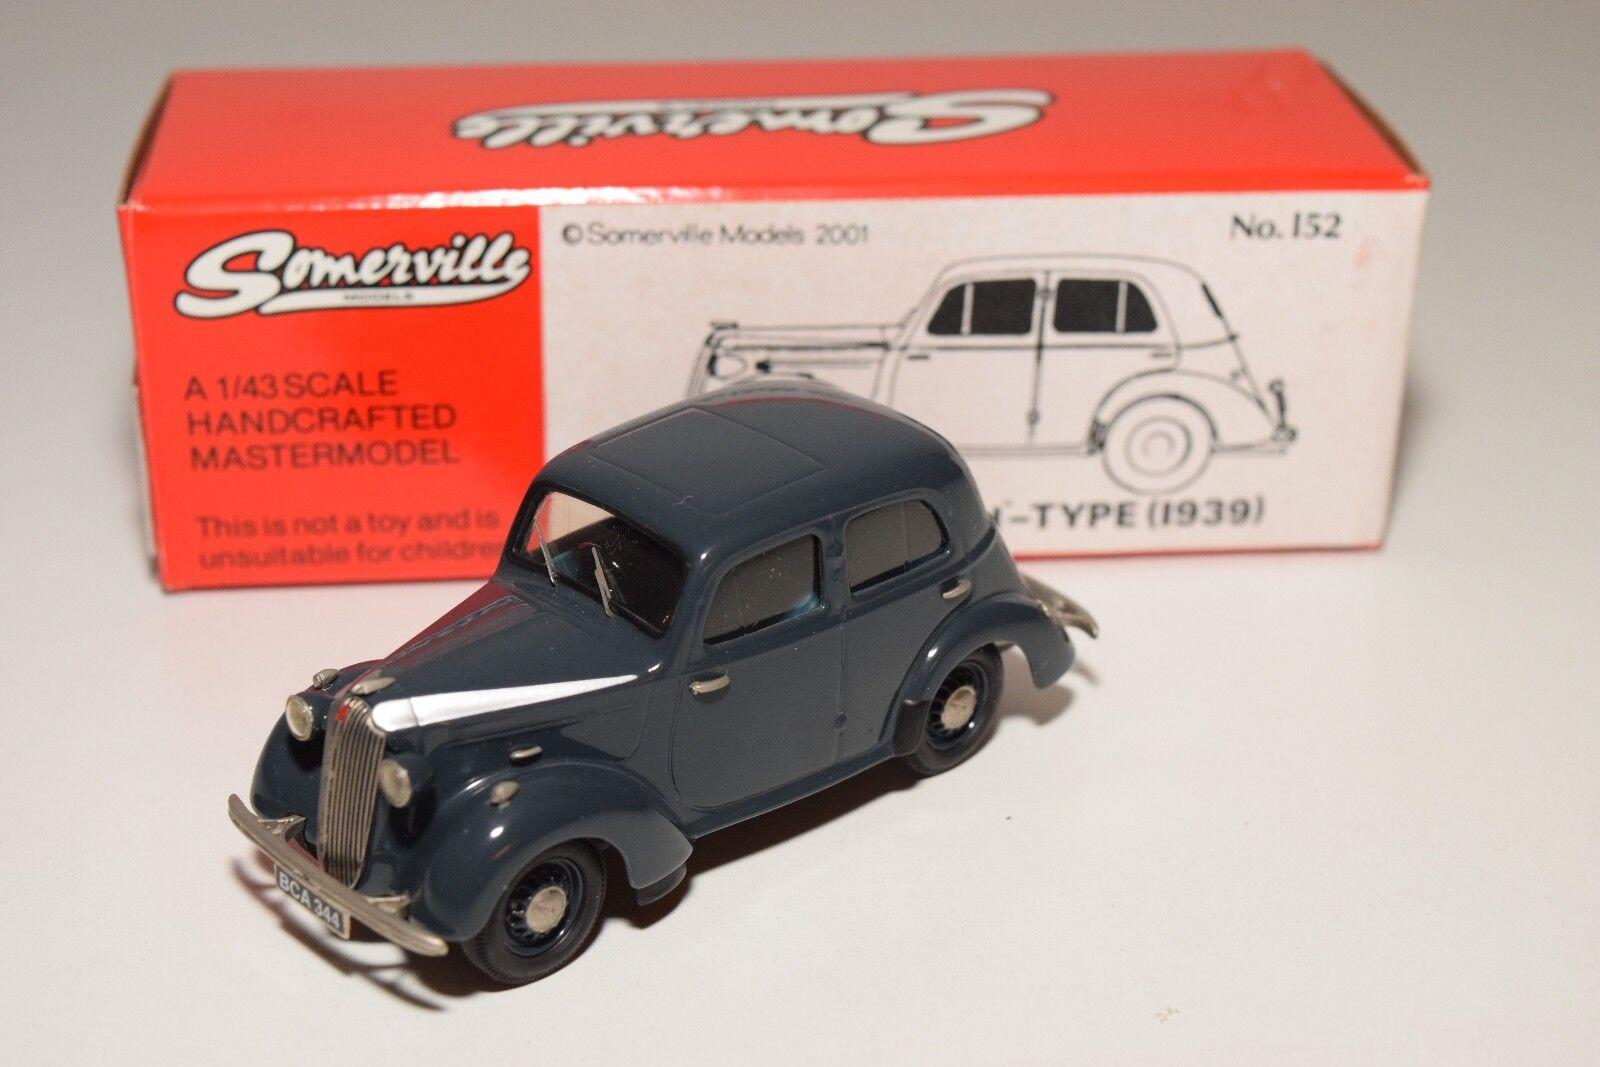 SOMERVILLE MODELS 152 VAUXHALL 10 H-TYPE VELOX 1939 gris-bleu MINT BOXED